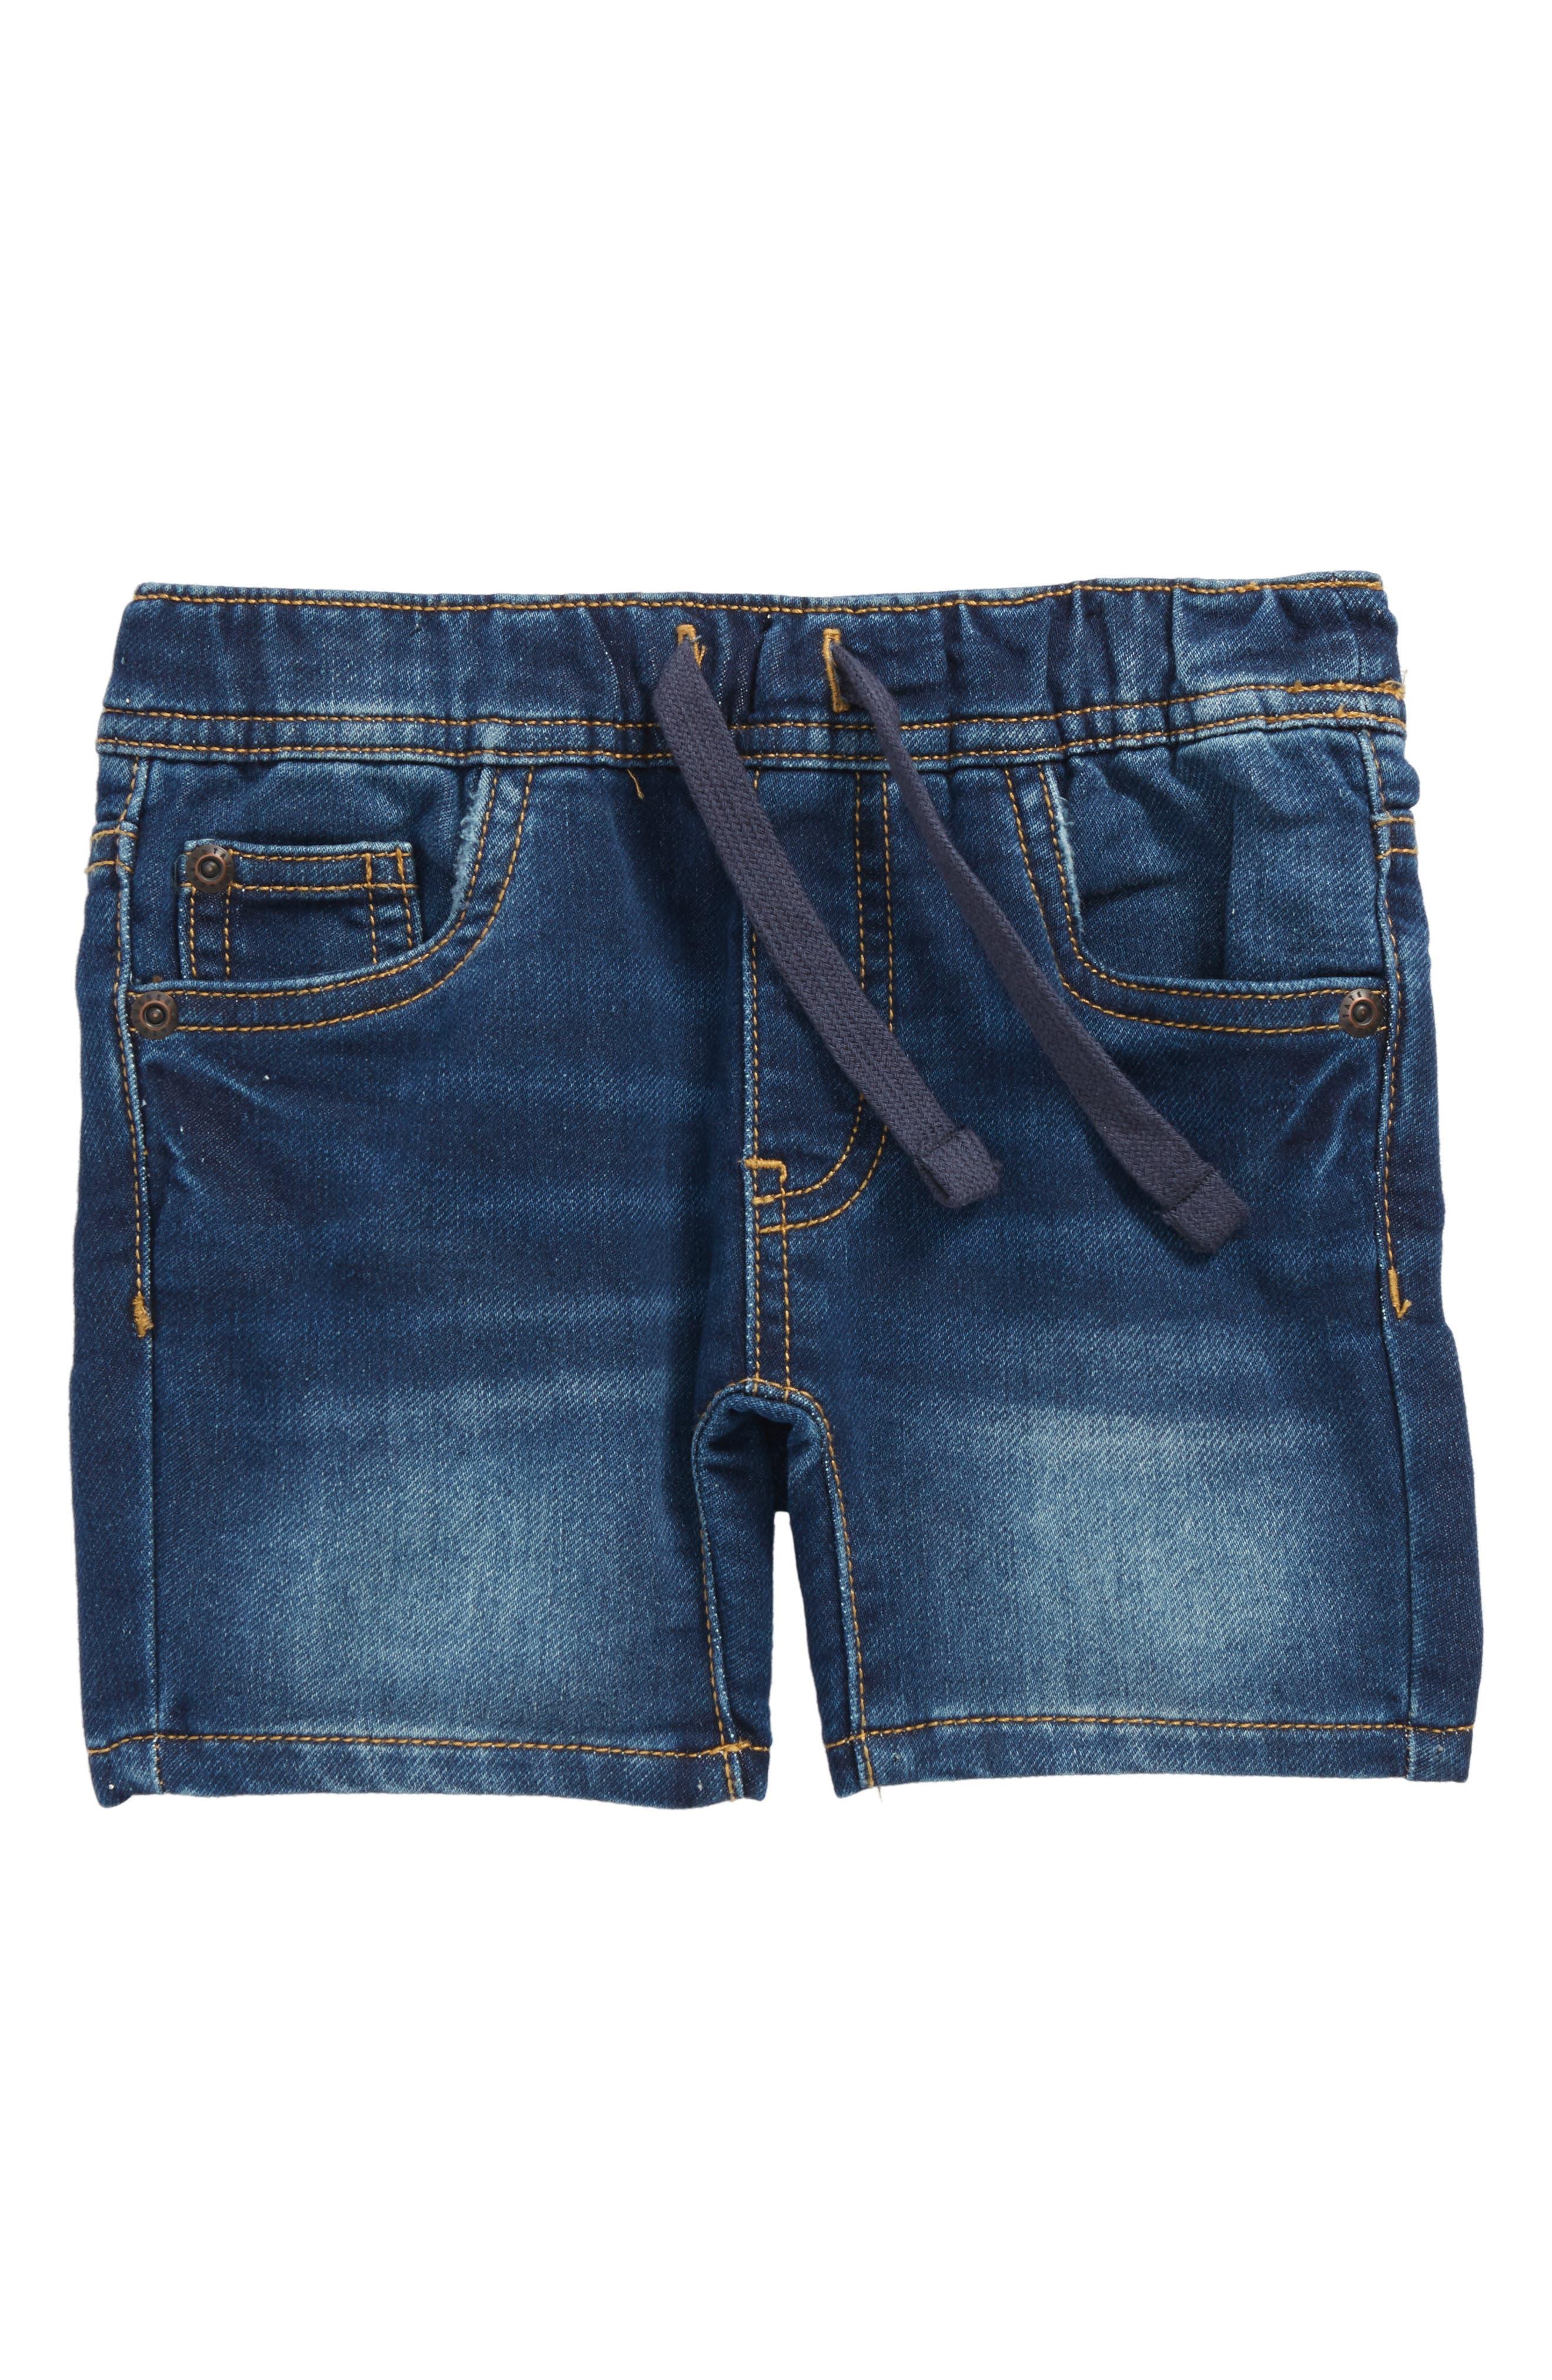 Tucker + Tate Denim Shorts (Baby)